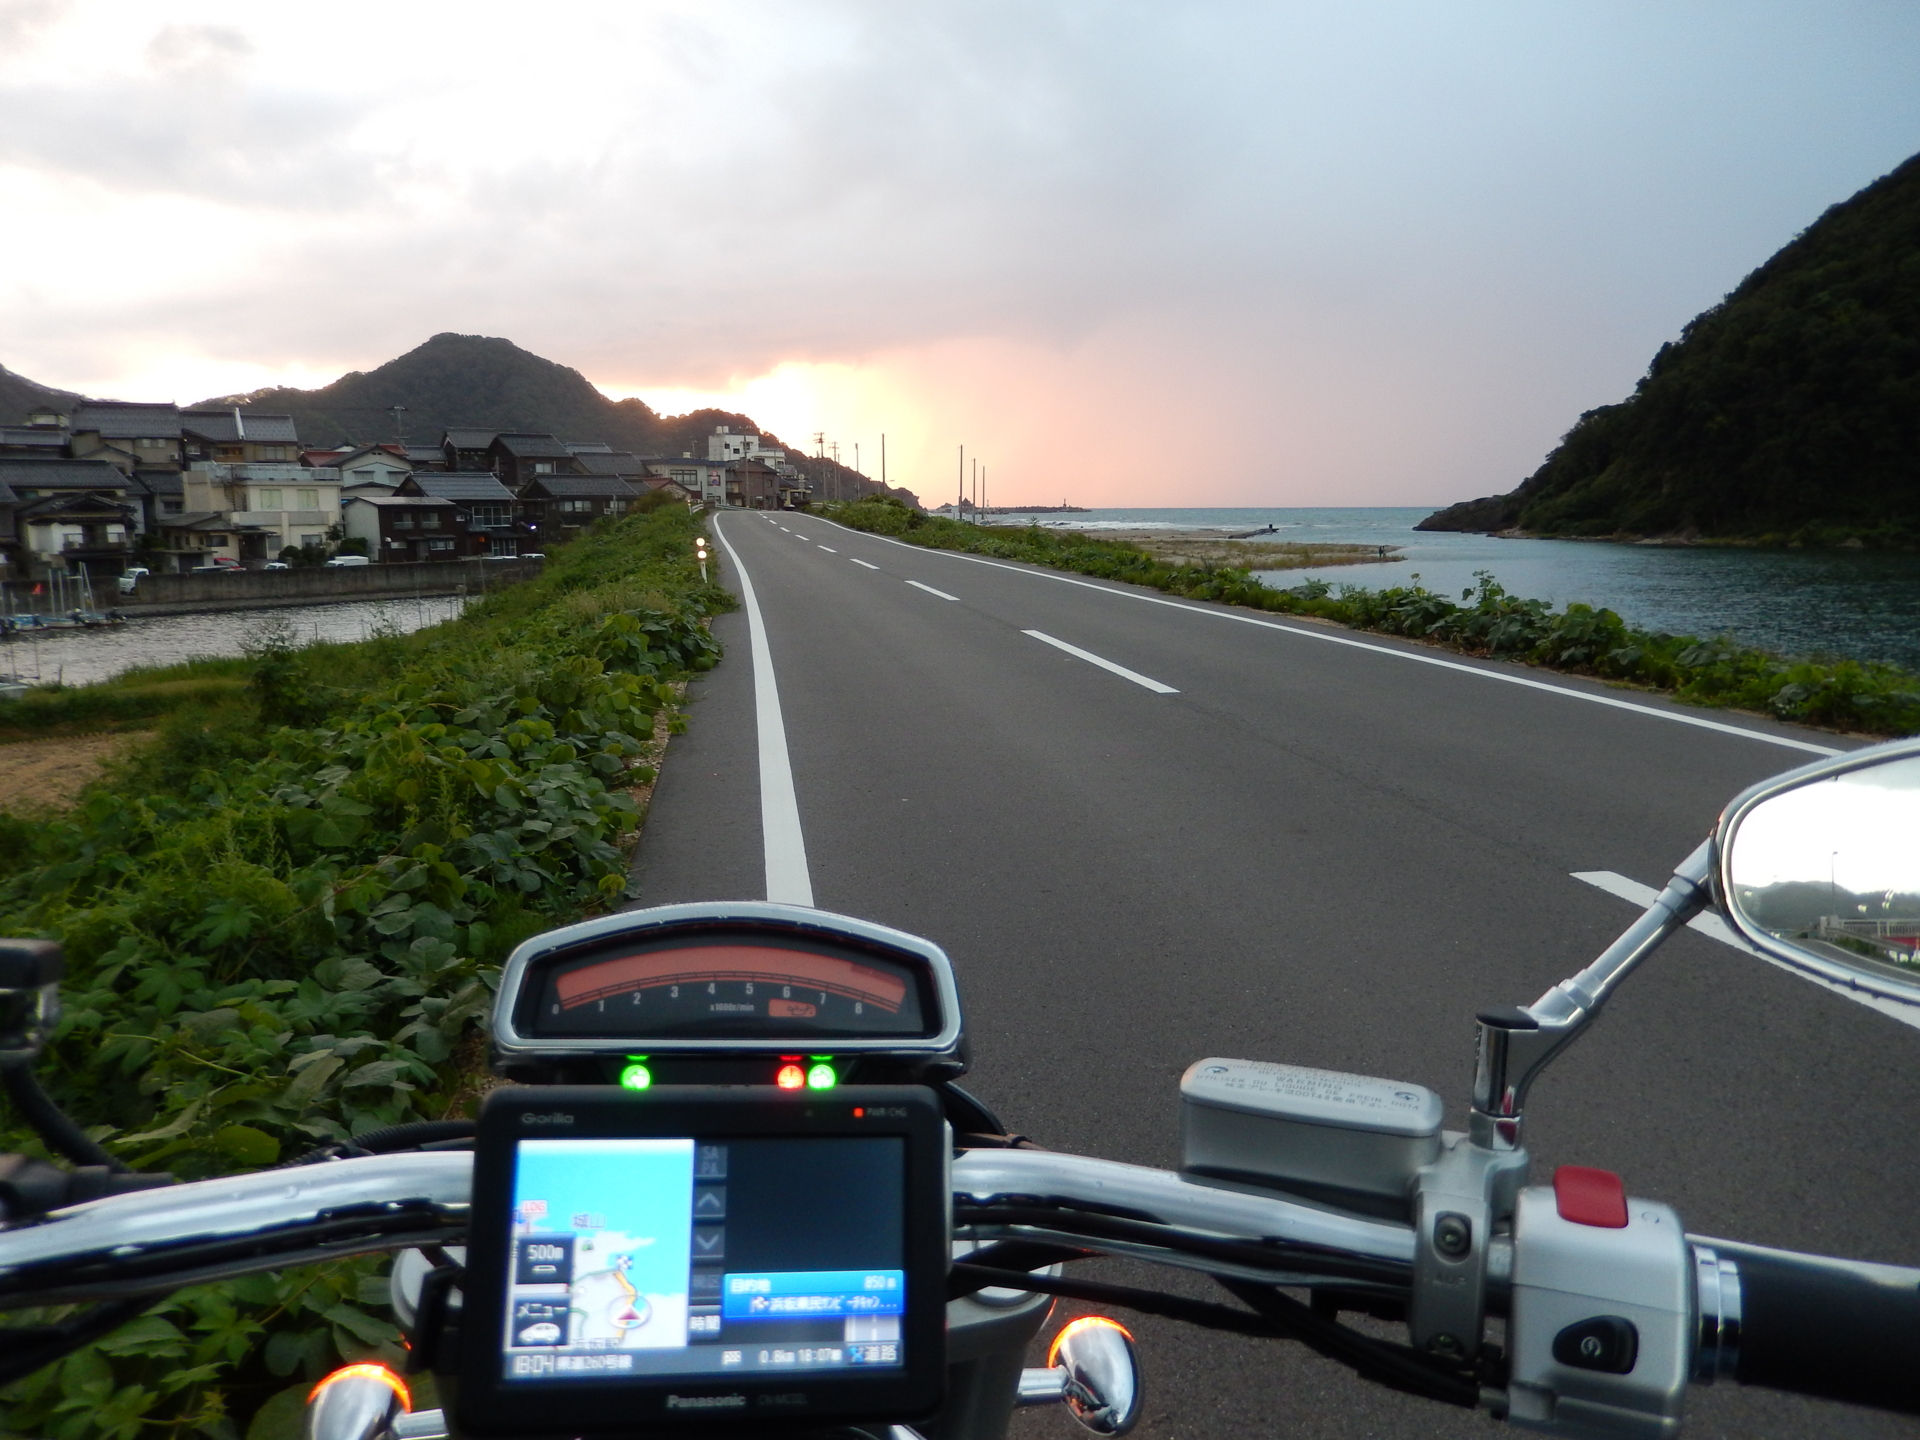 f:id:ToshUeno:20140913180431j:plain